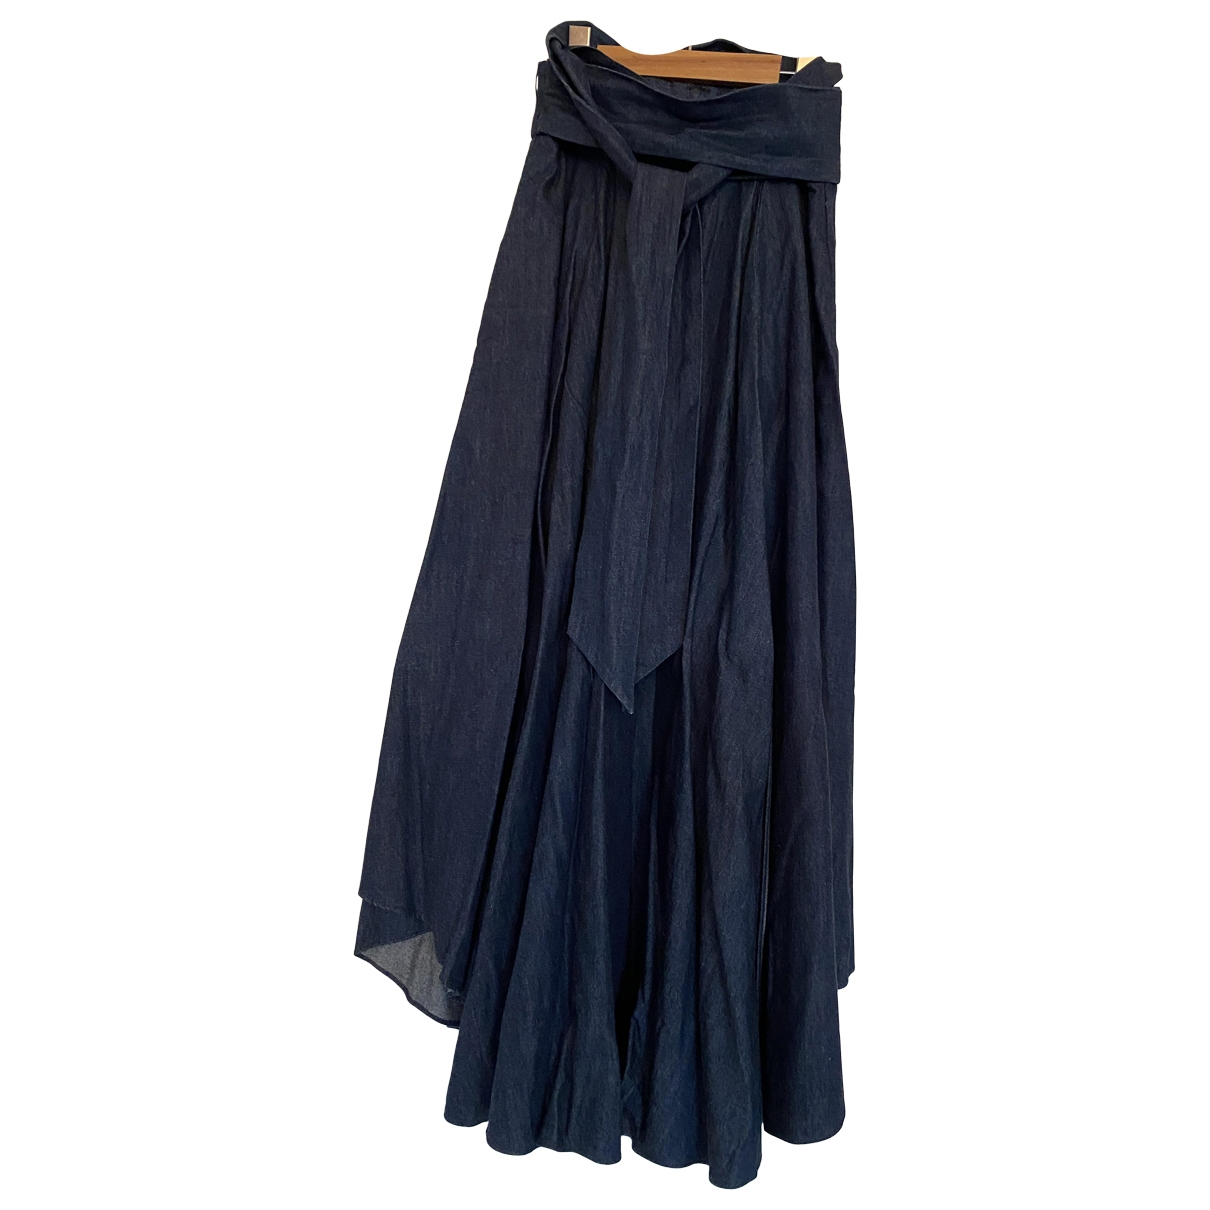 Tibi - Jupe   pour femme en denim - bleu